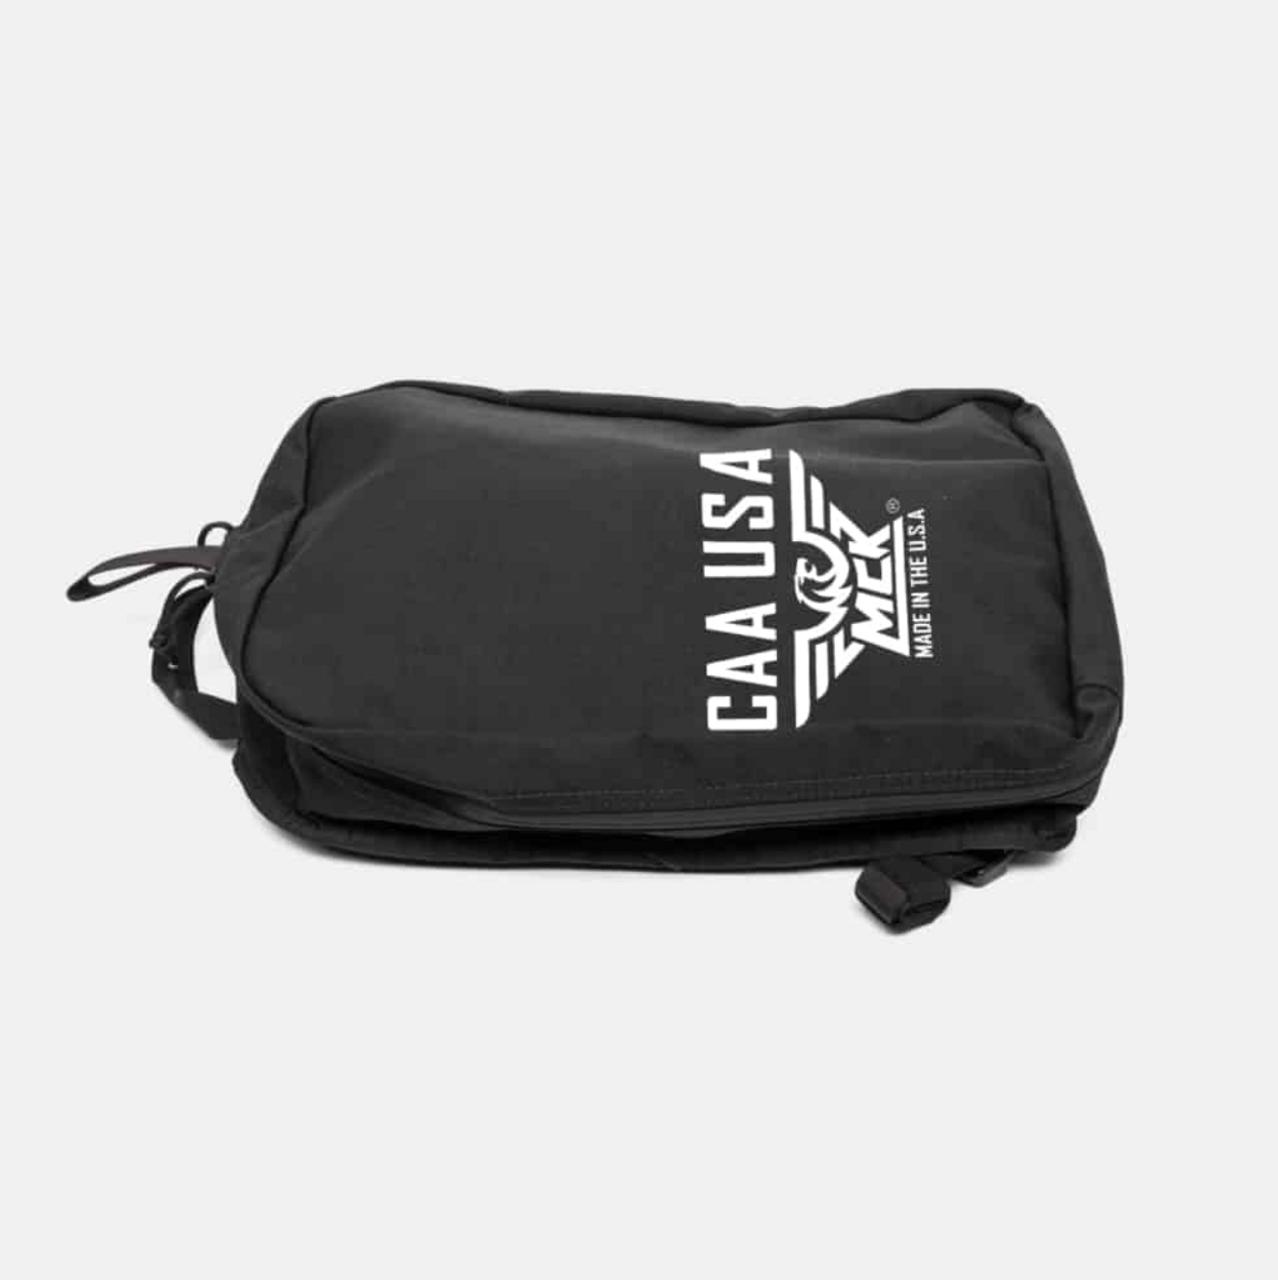 MCK BSB Ballistic Sling Bag CAA USA